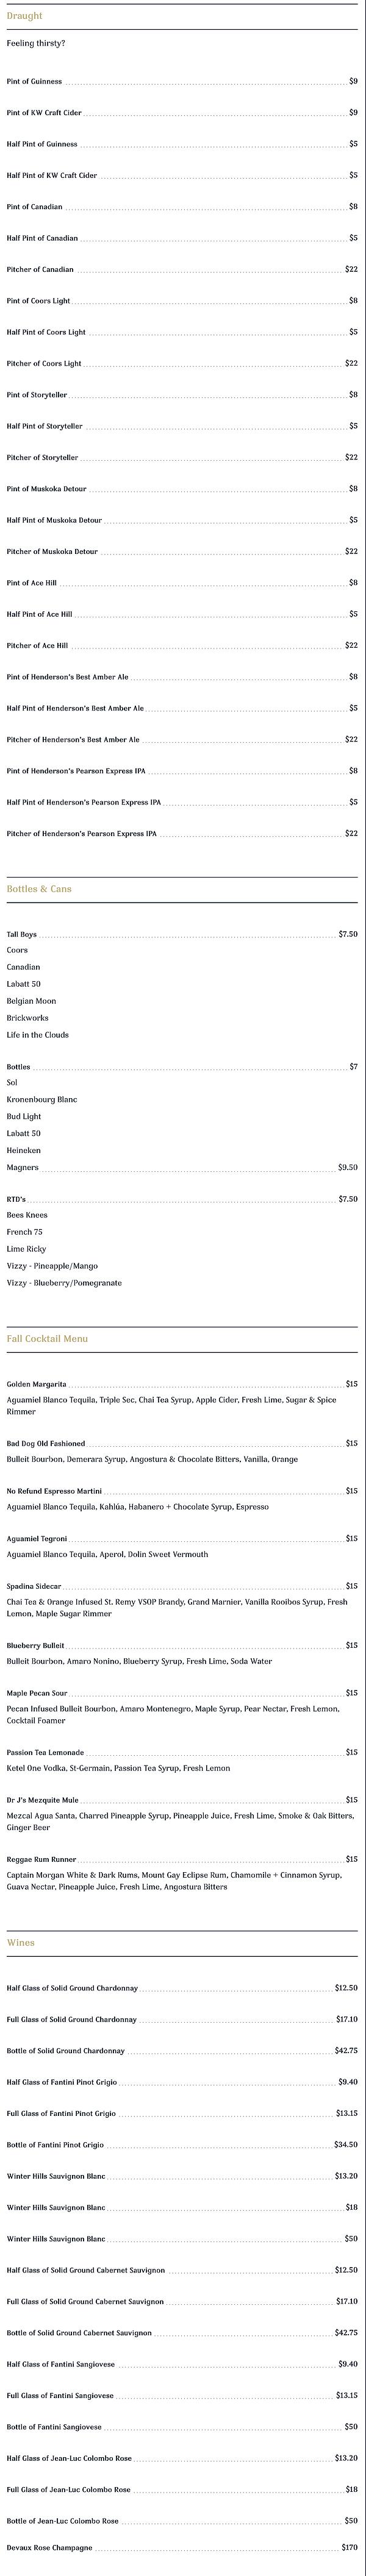 fox draught menu oct 27 2021.png